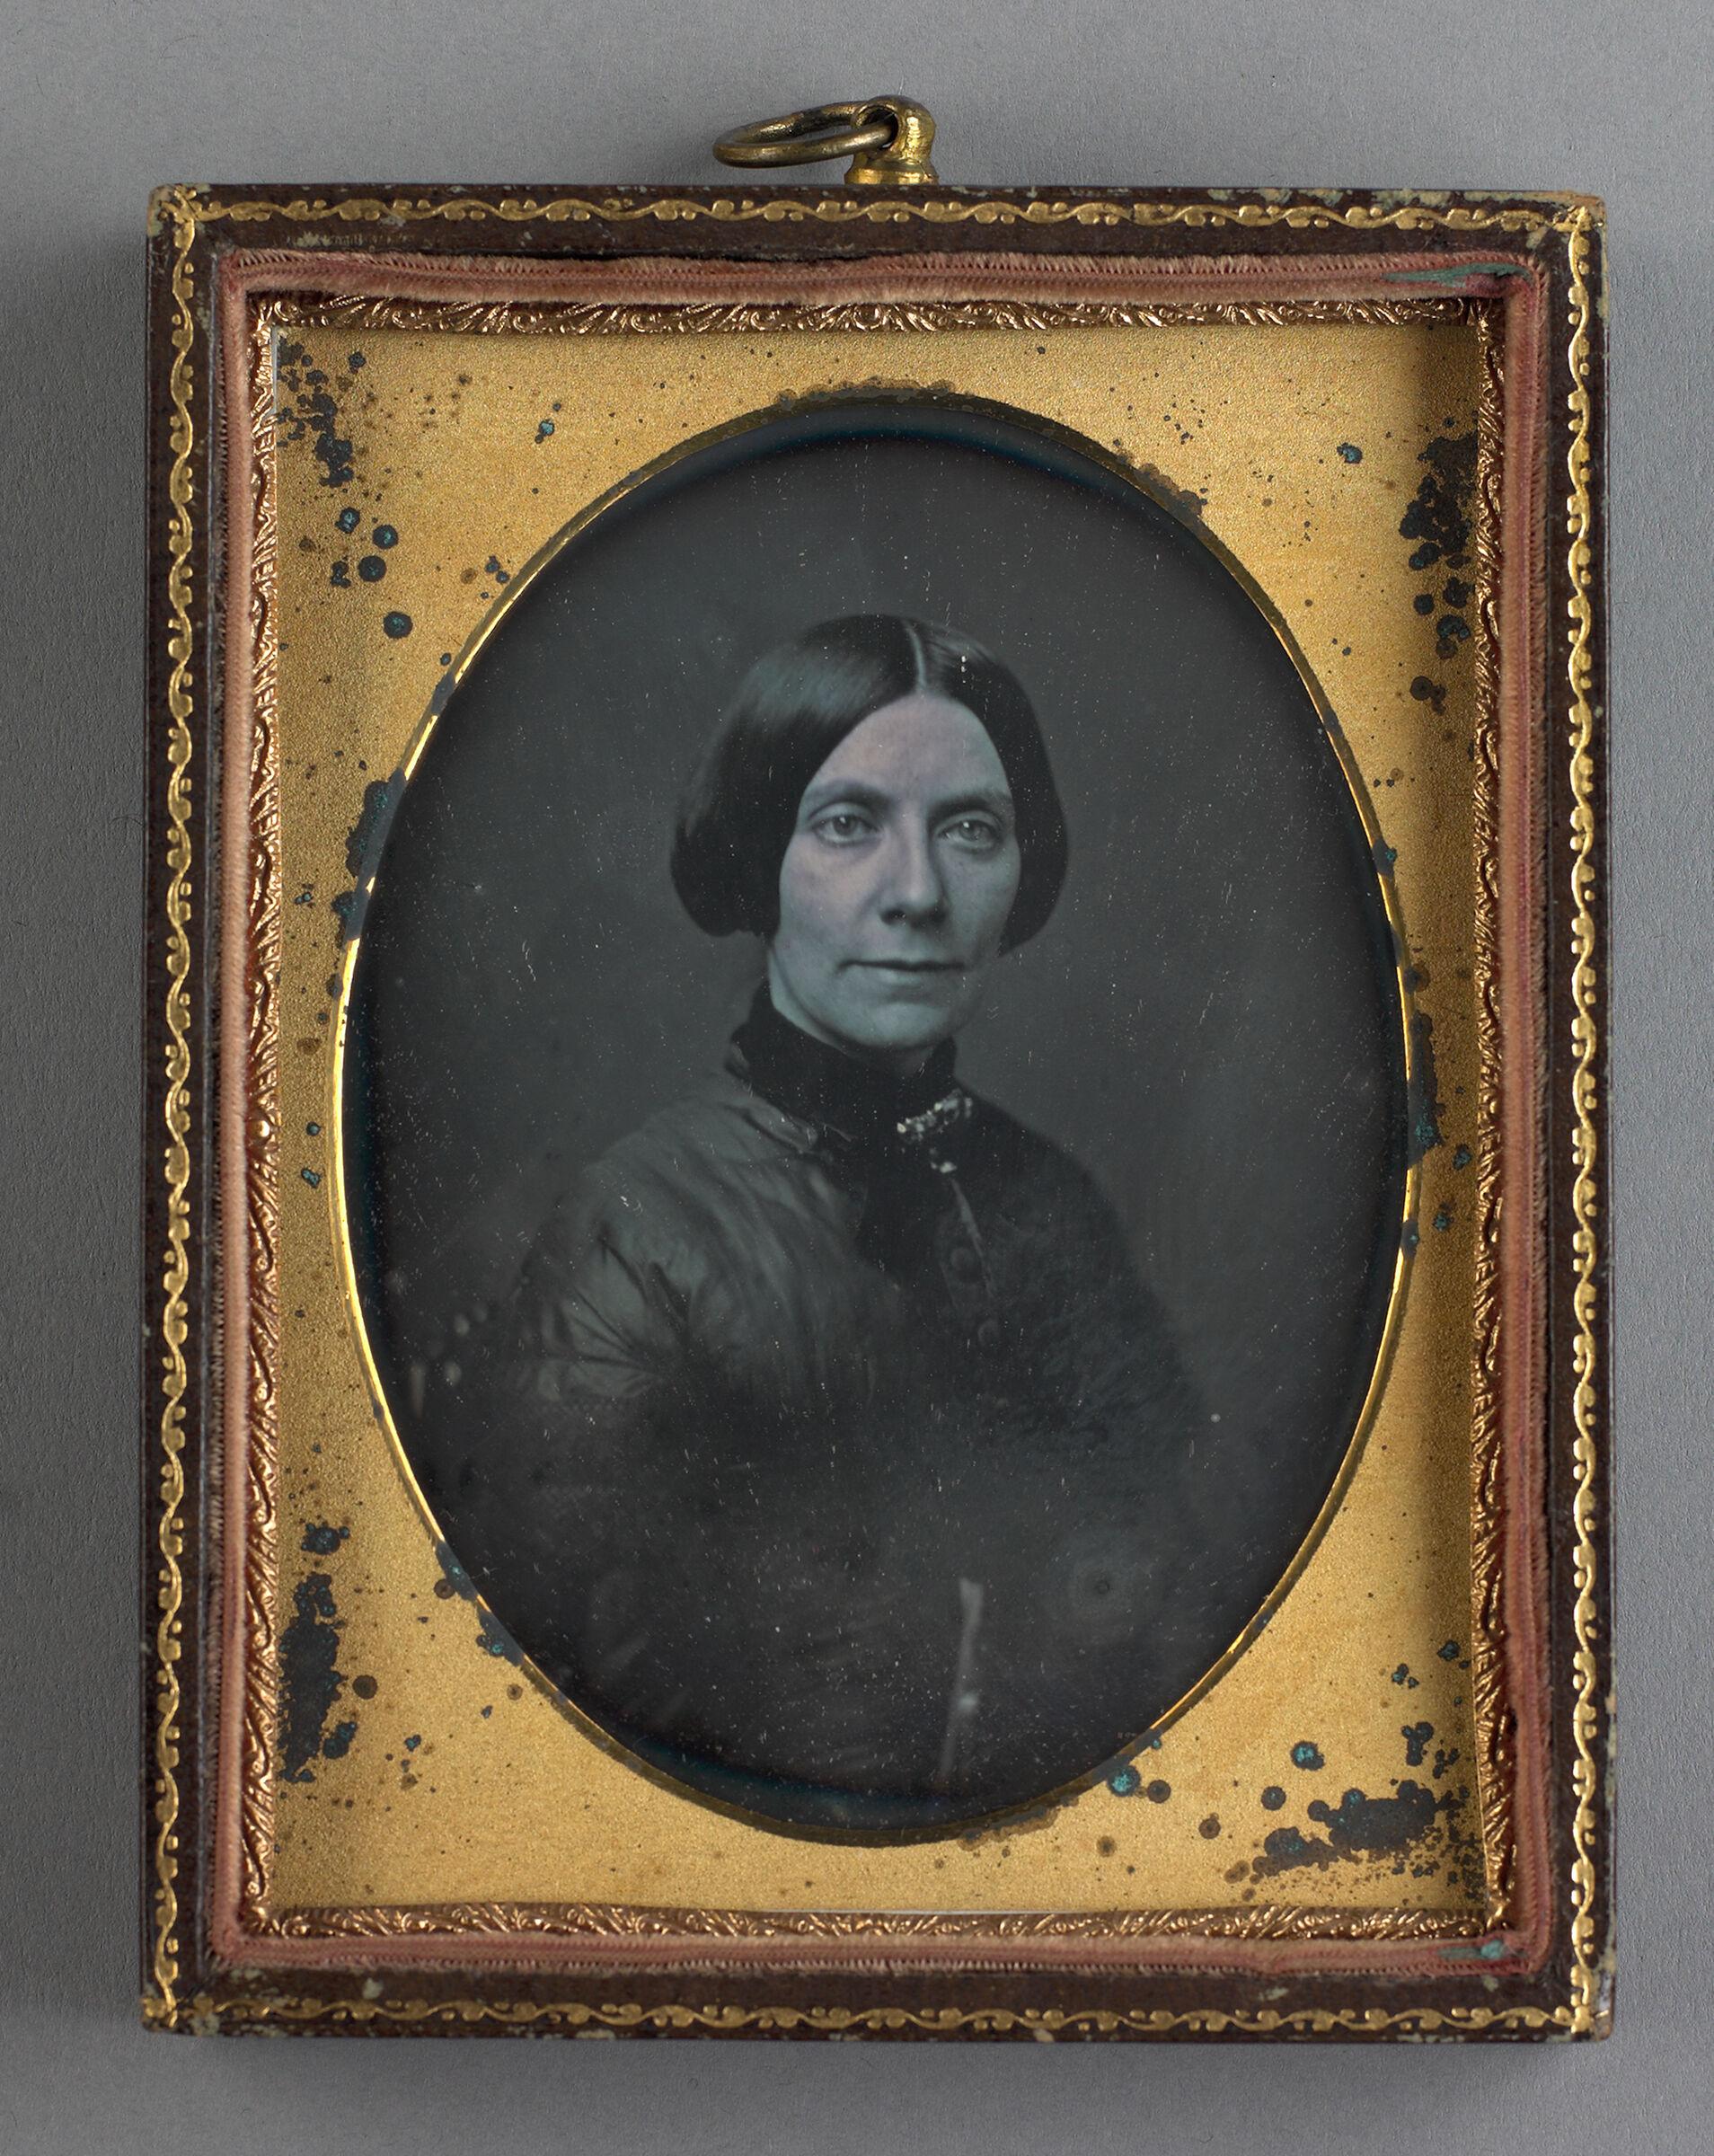 Emma Dorothy Eliza Nevitte Southworth (1819-1899)